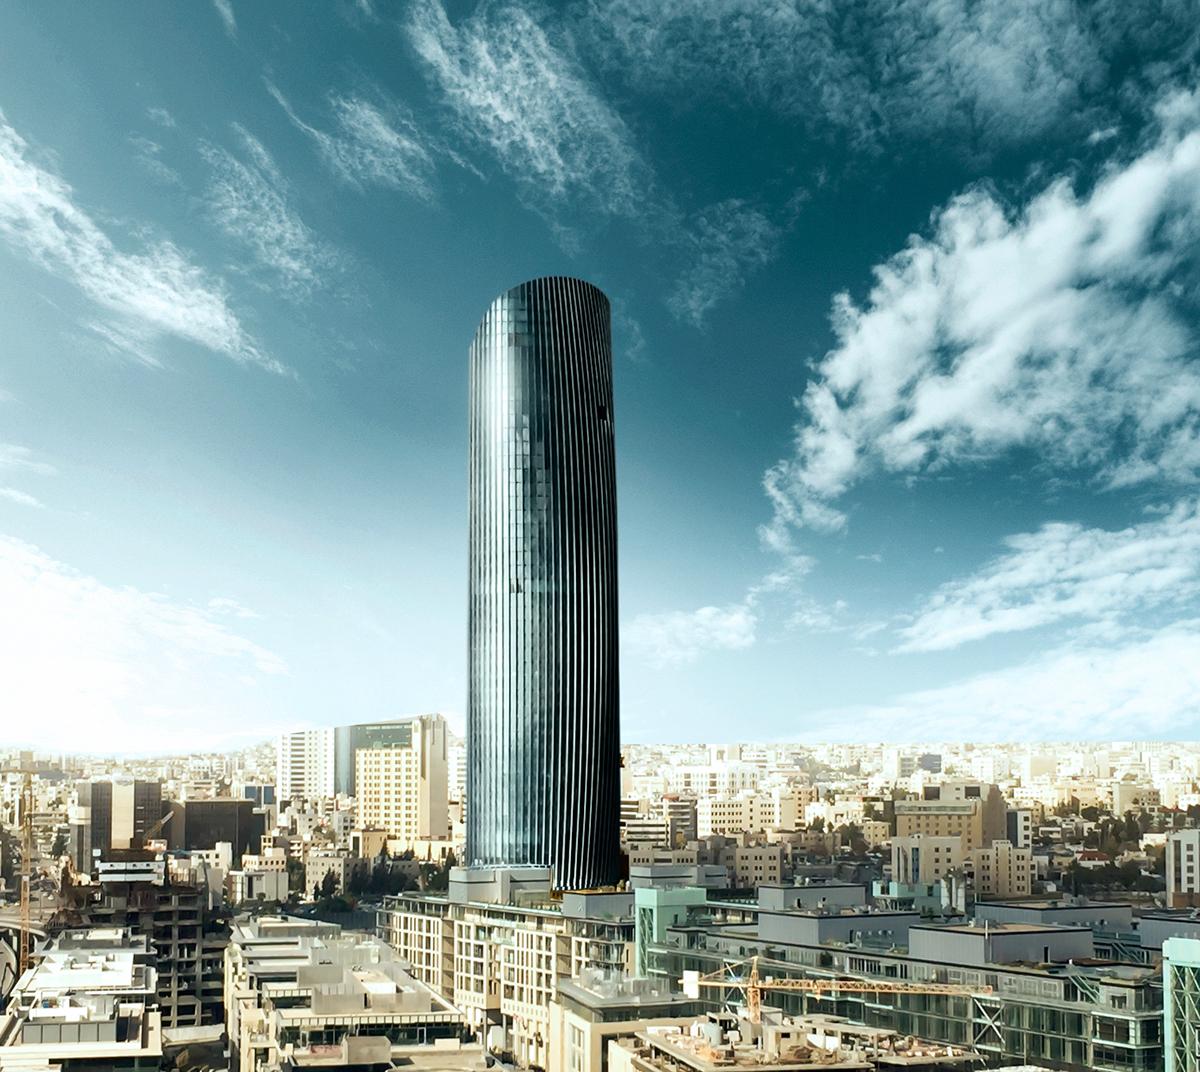 rotana tower 3D achi jordan amman Y&R